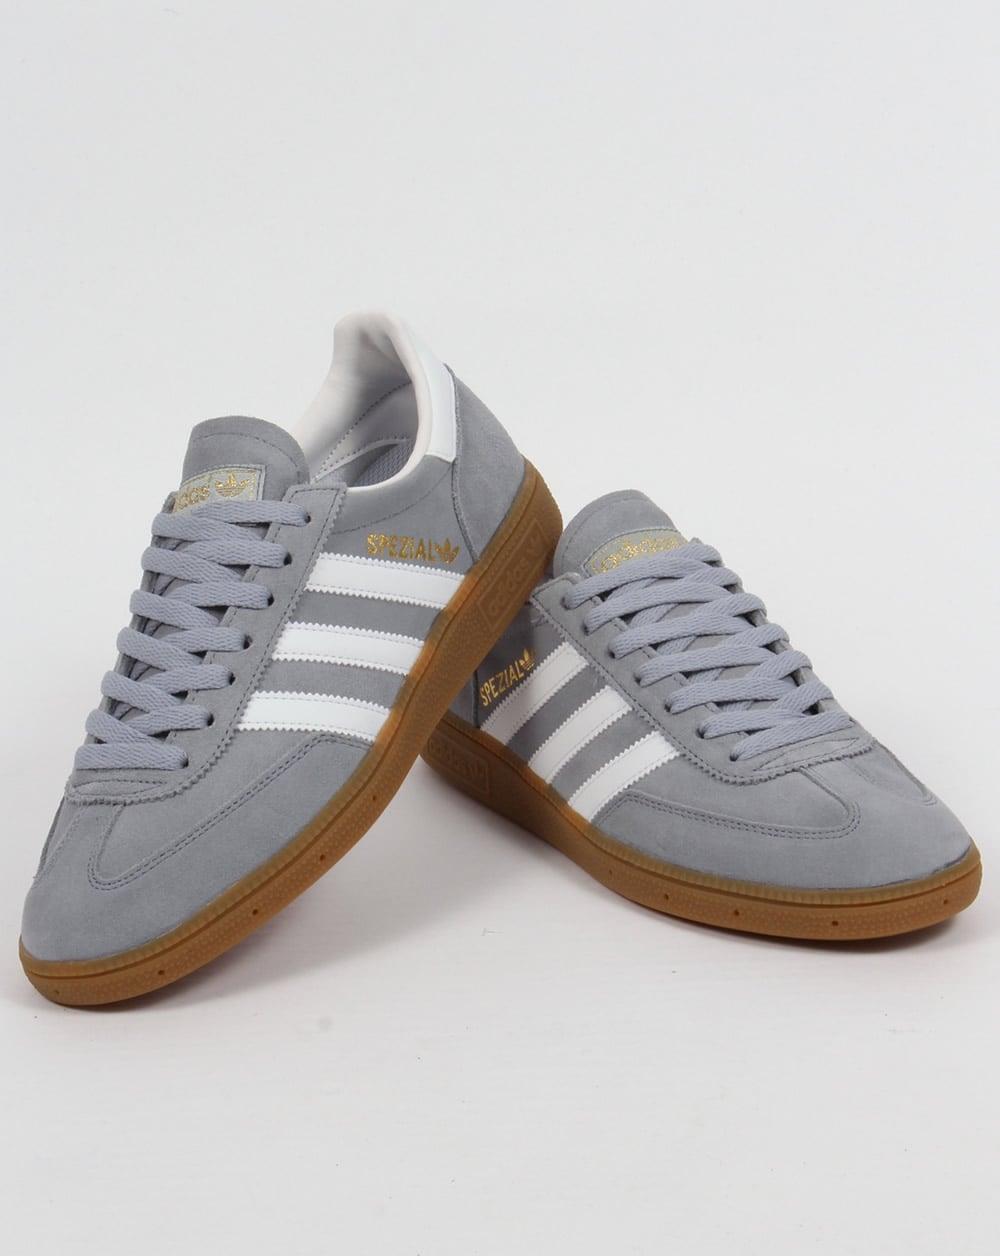 Adidas Spezial Trainers Light Grey/White